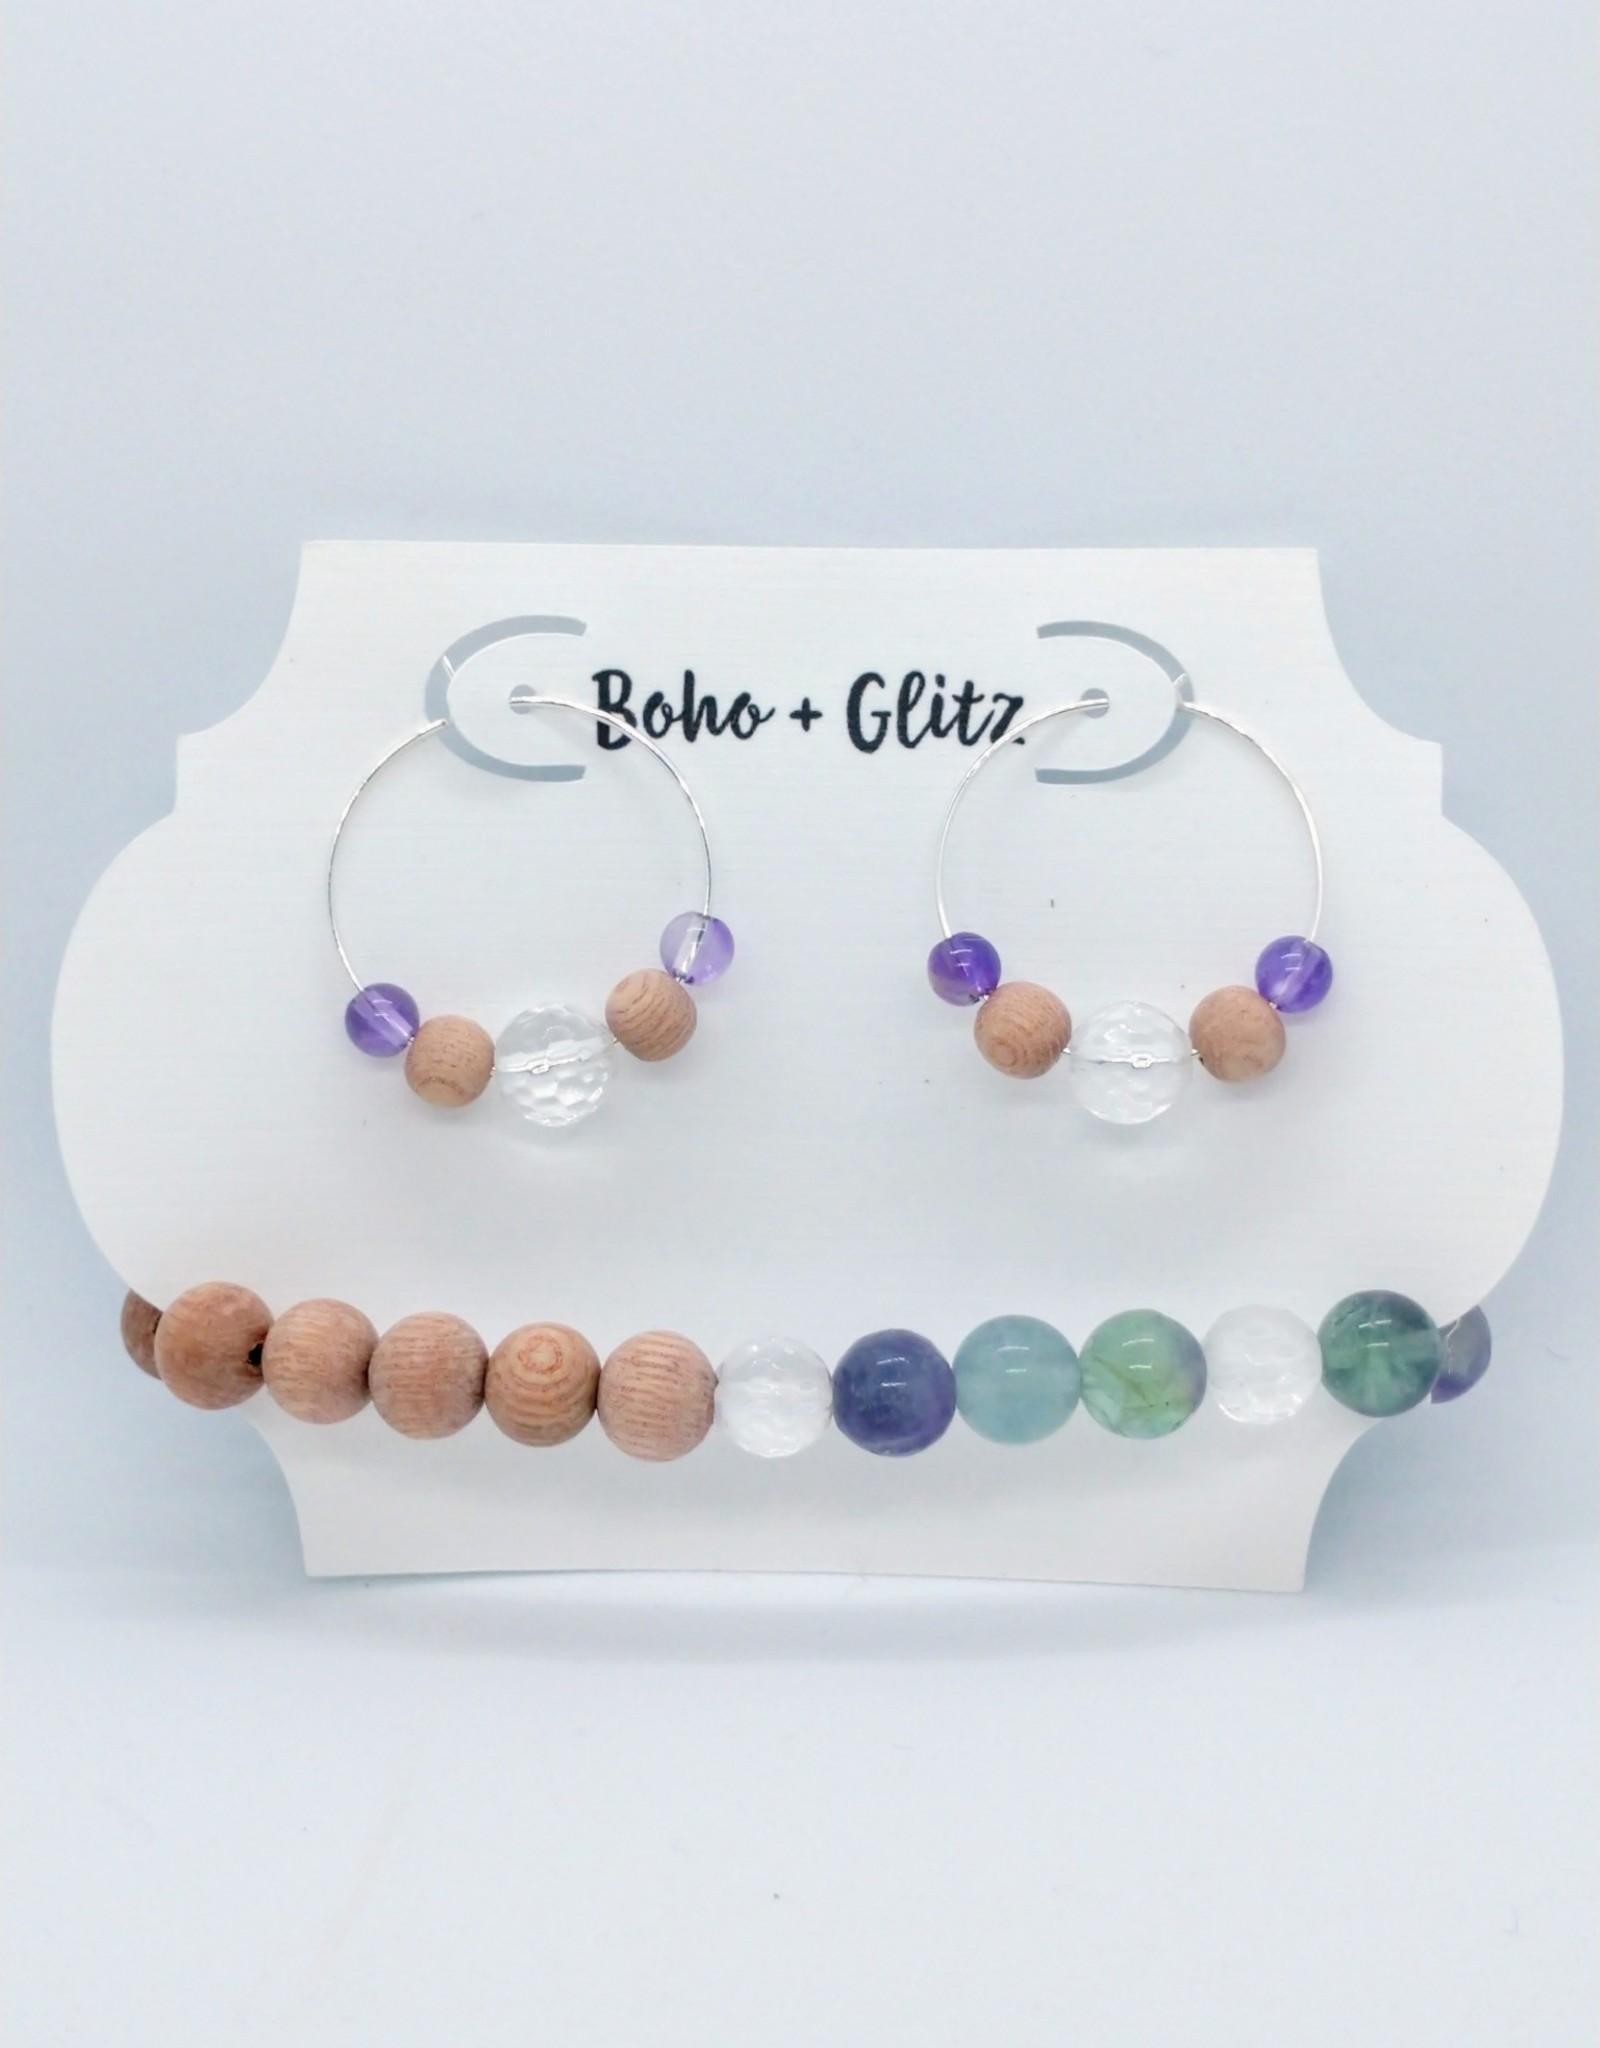 Boho & Glitz Boho & Glitz - Earring and Bracelet Combo ID5